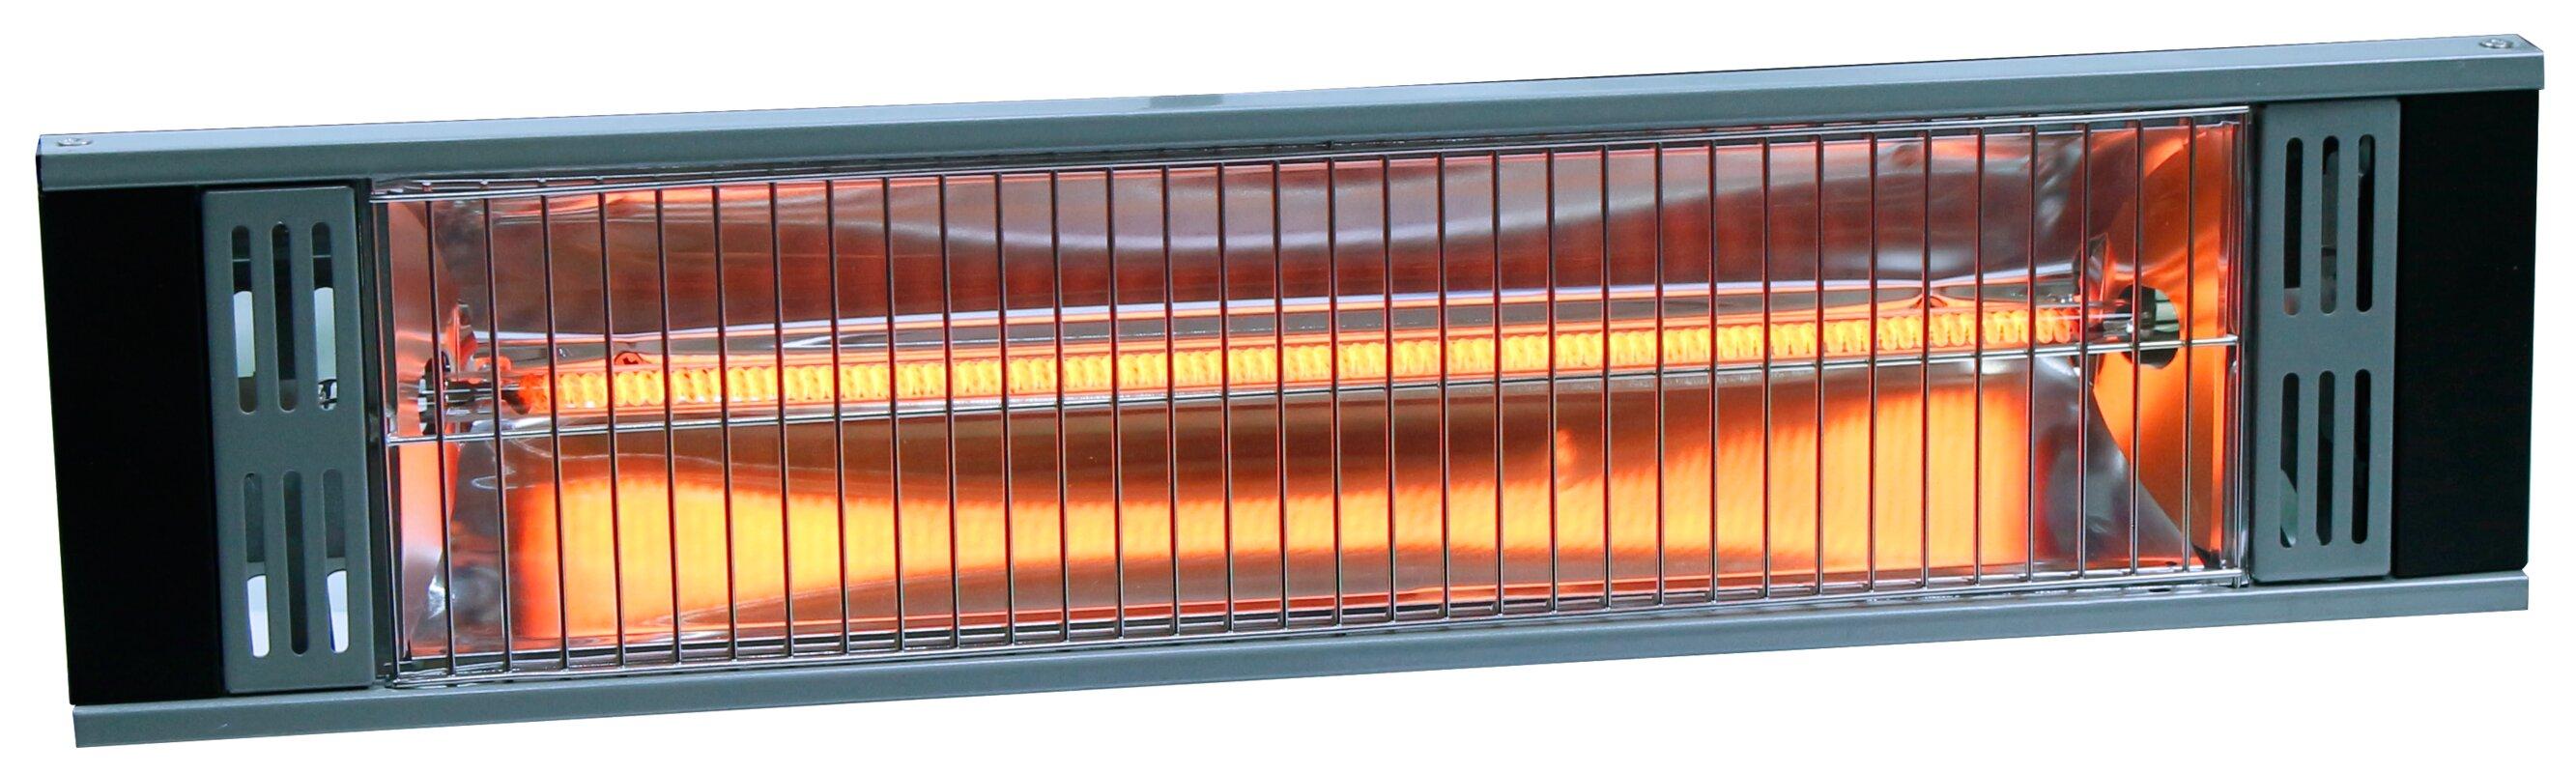 ... Electric Patio Heaters; SKU: RVJ1002. Default_name